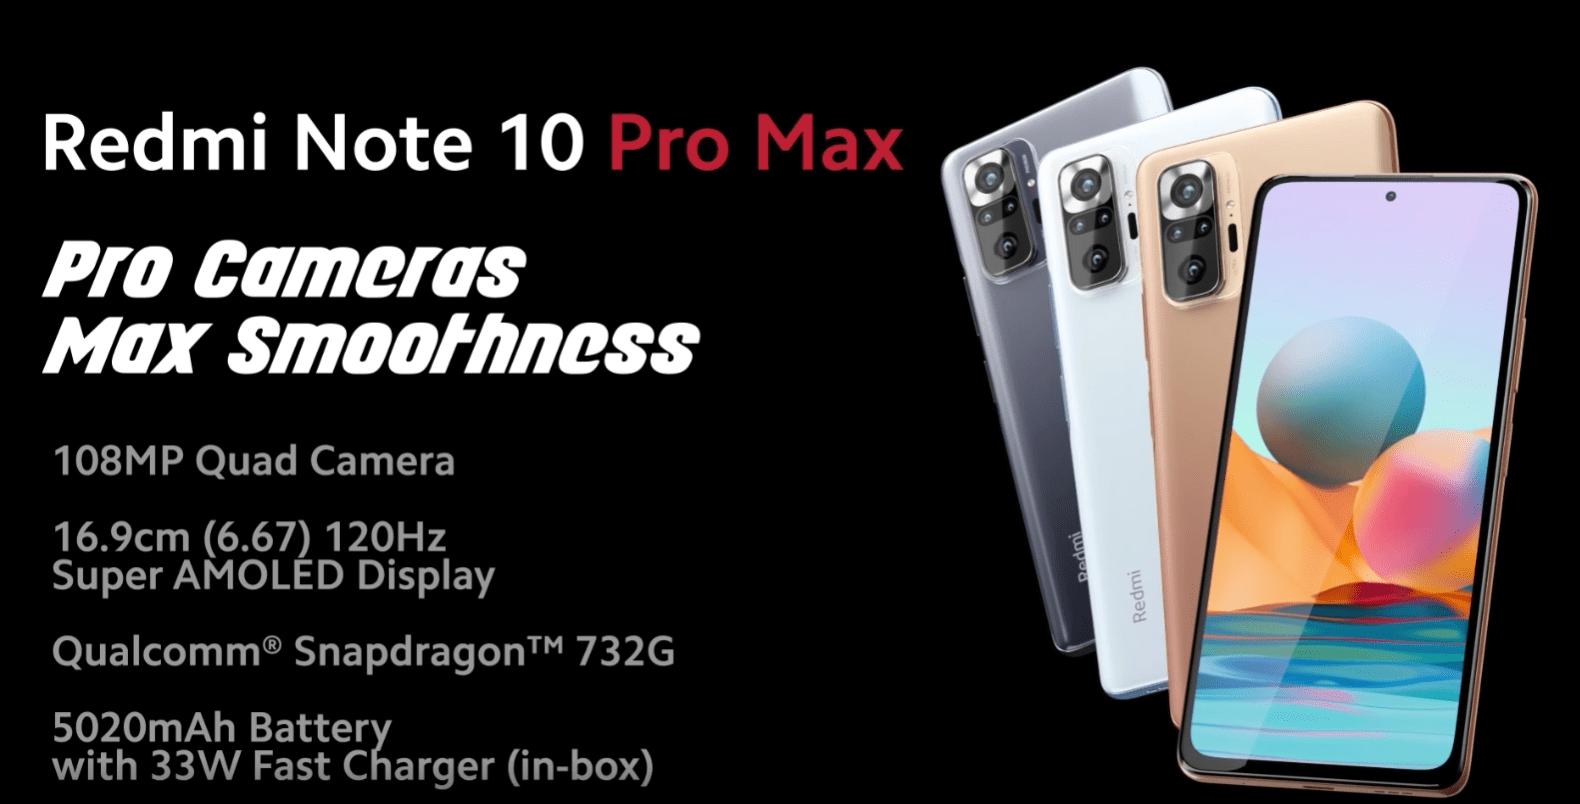 Amazon.in Redmi Note 10 Pro Max Electronics